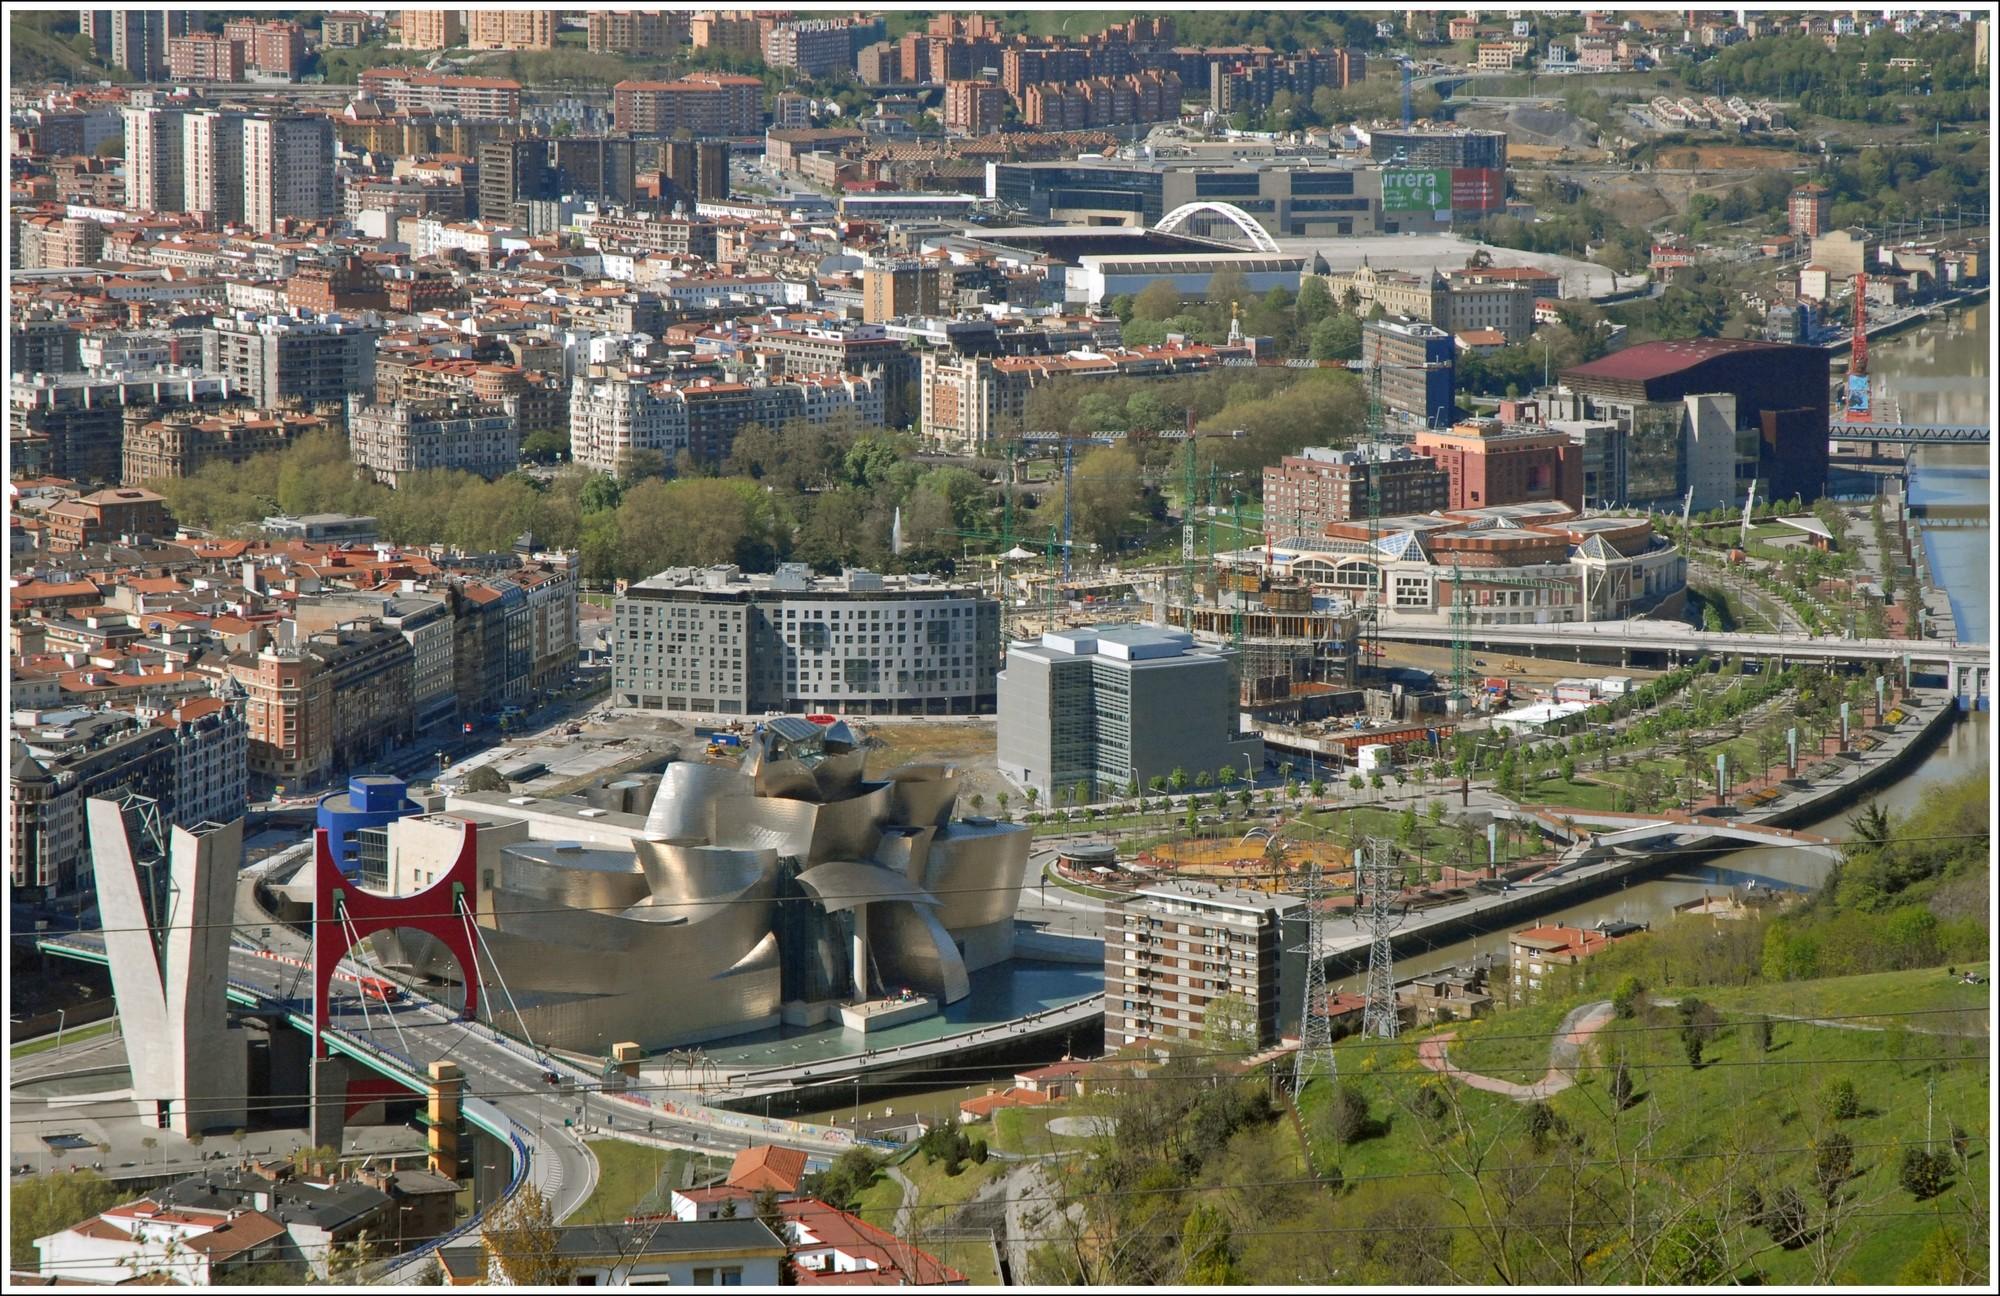 Museo Guggenheim en barrio de Abandoibarra, Bilbao. Image © Jean-Pierre Dalbéra [Flickr]